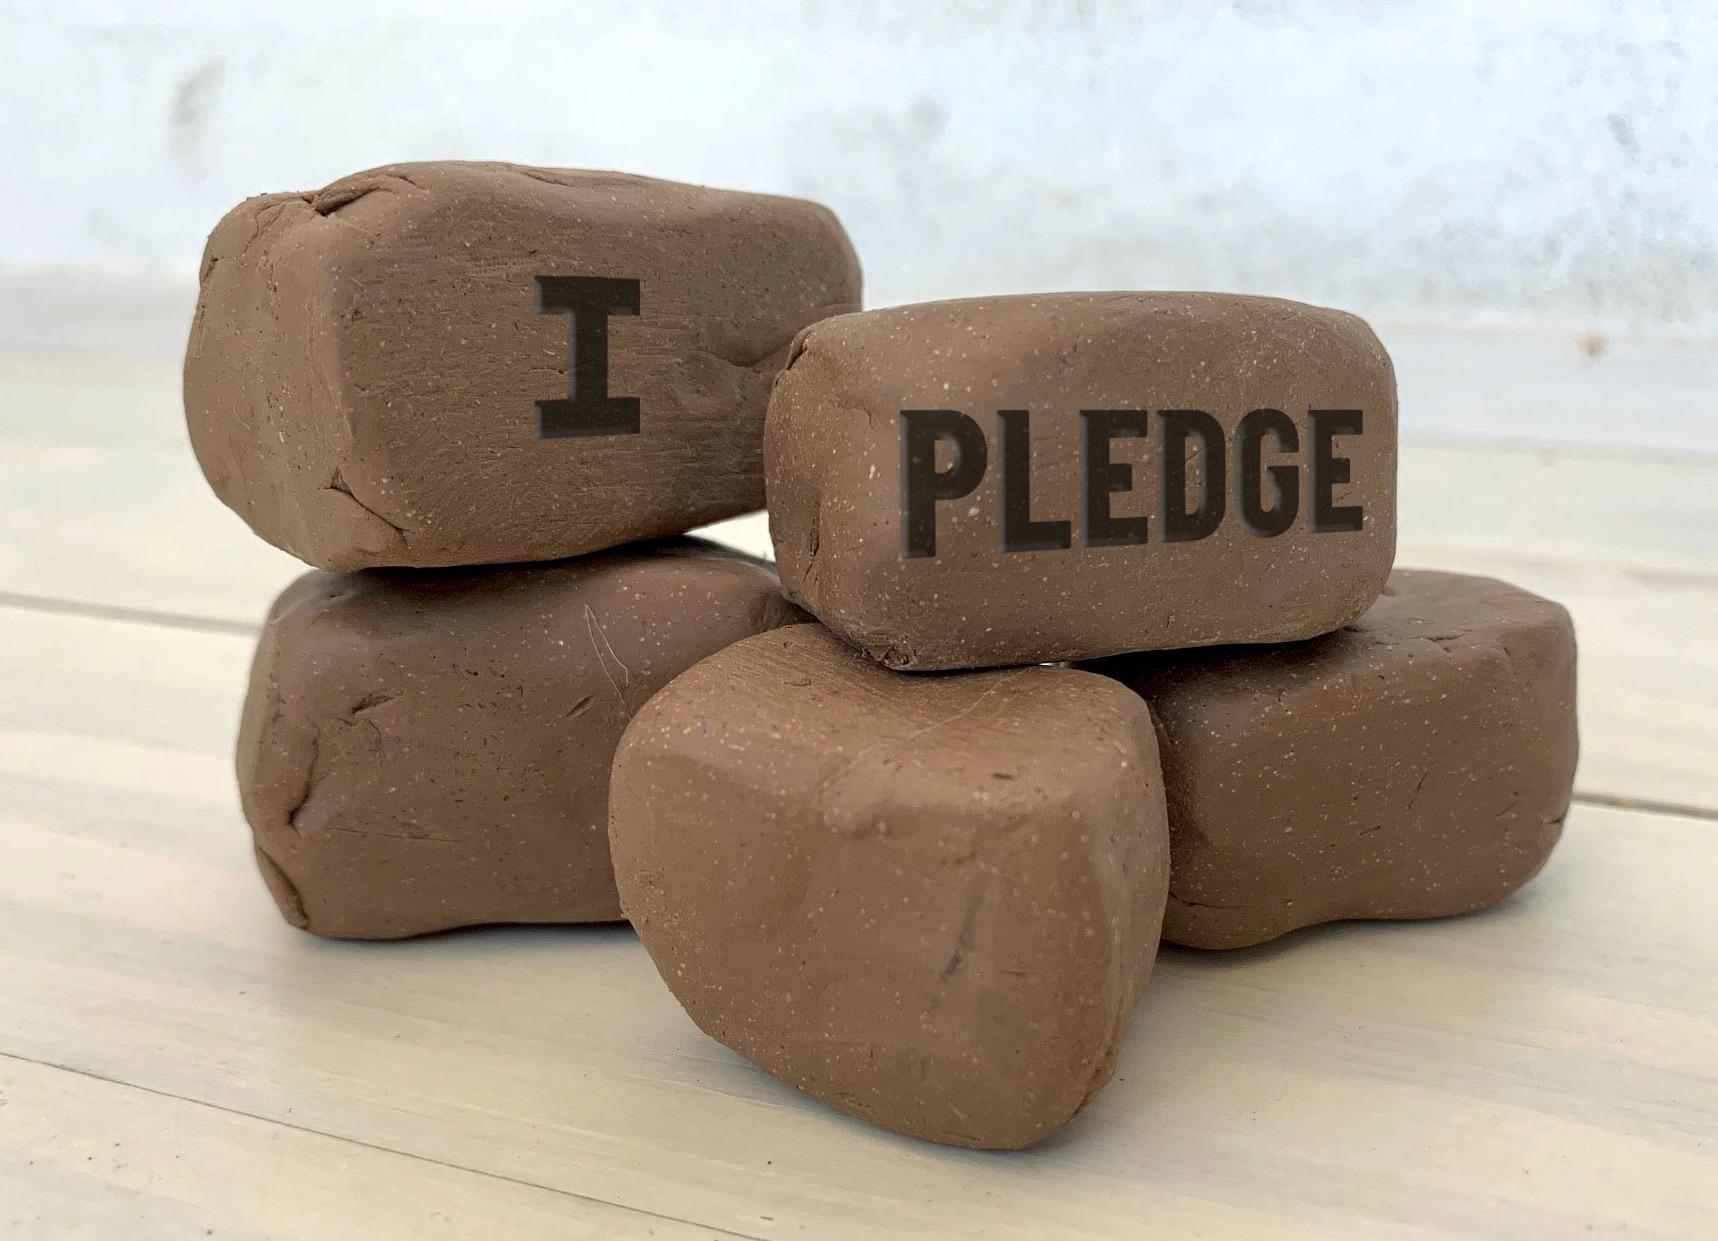 I-Pledge (1).jpg